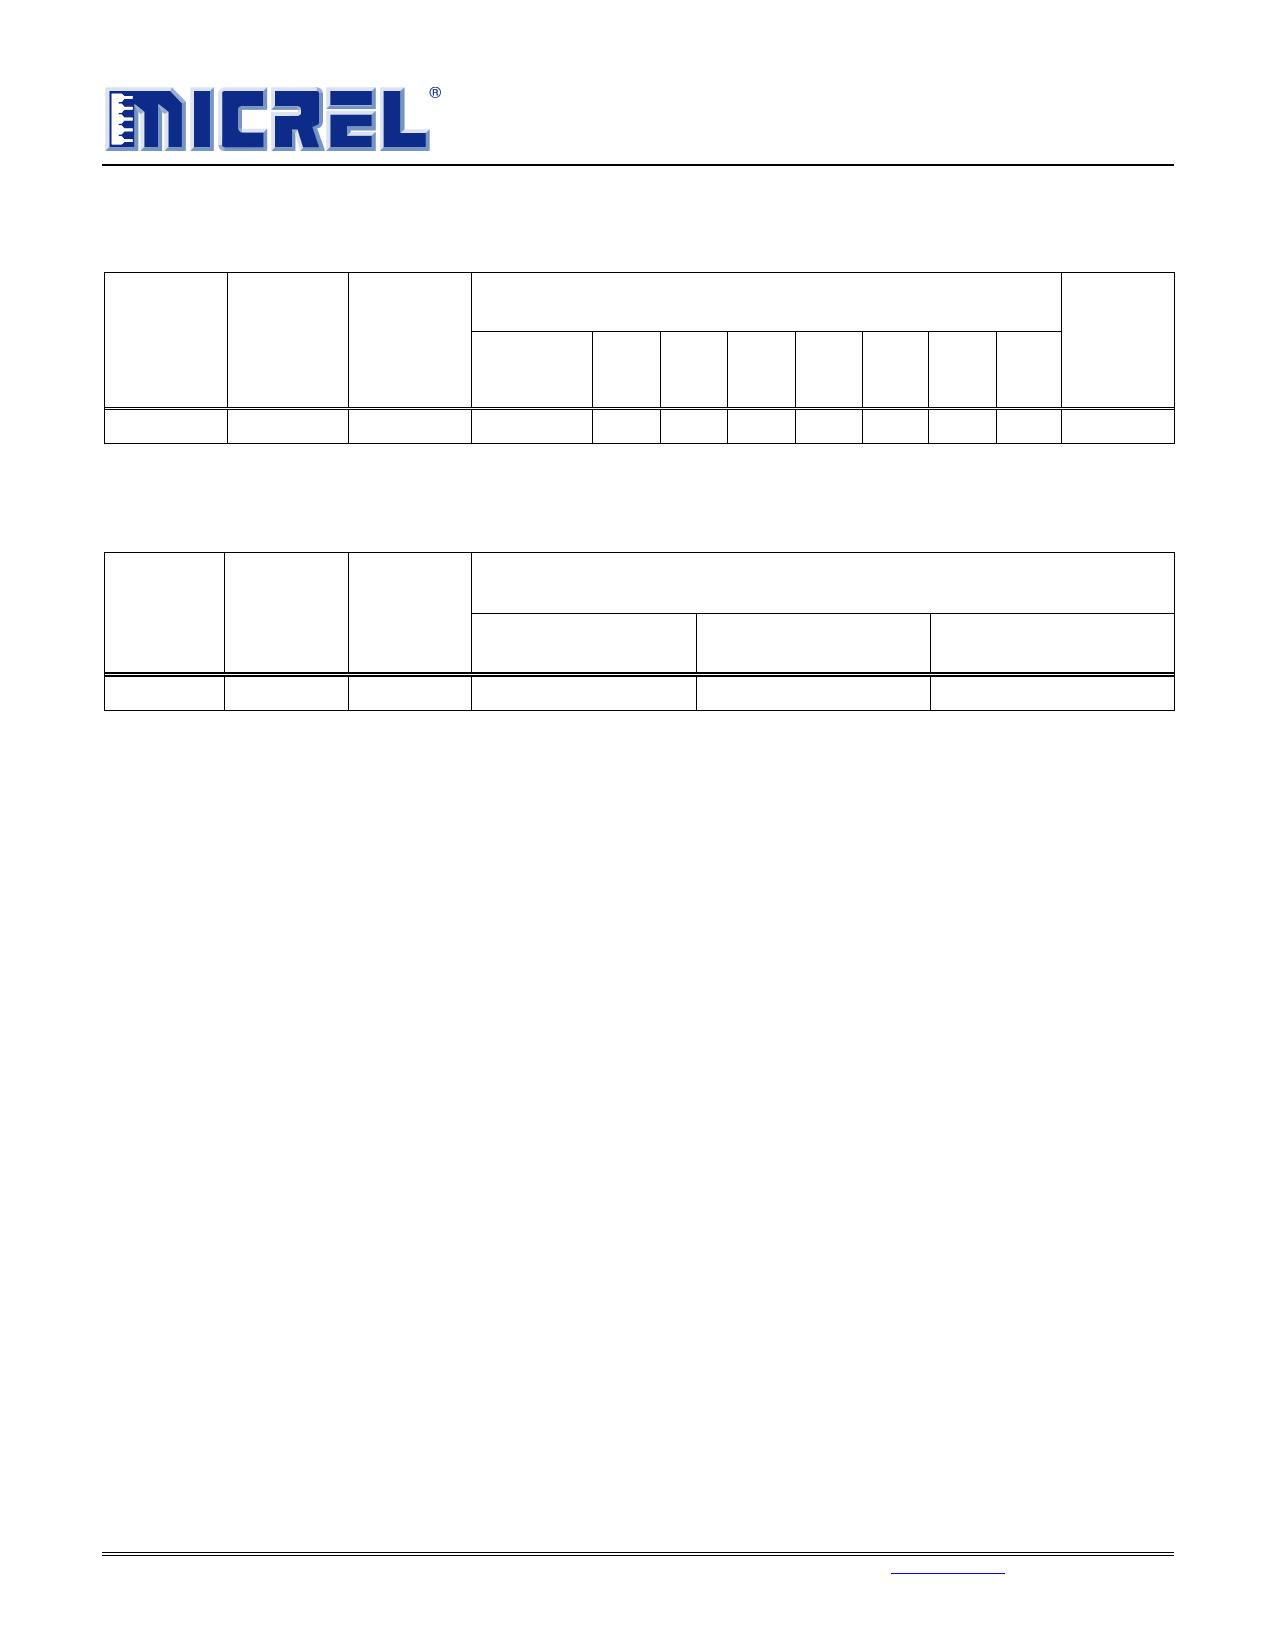 PL565-68 pdf, 반도체, 판매, 대치품